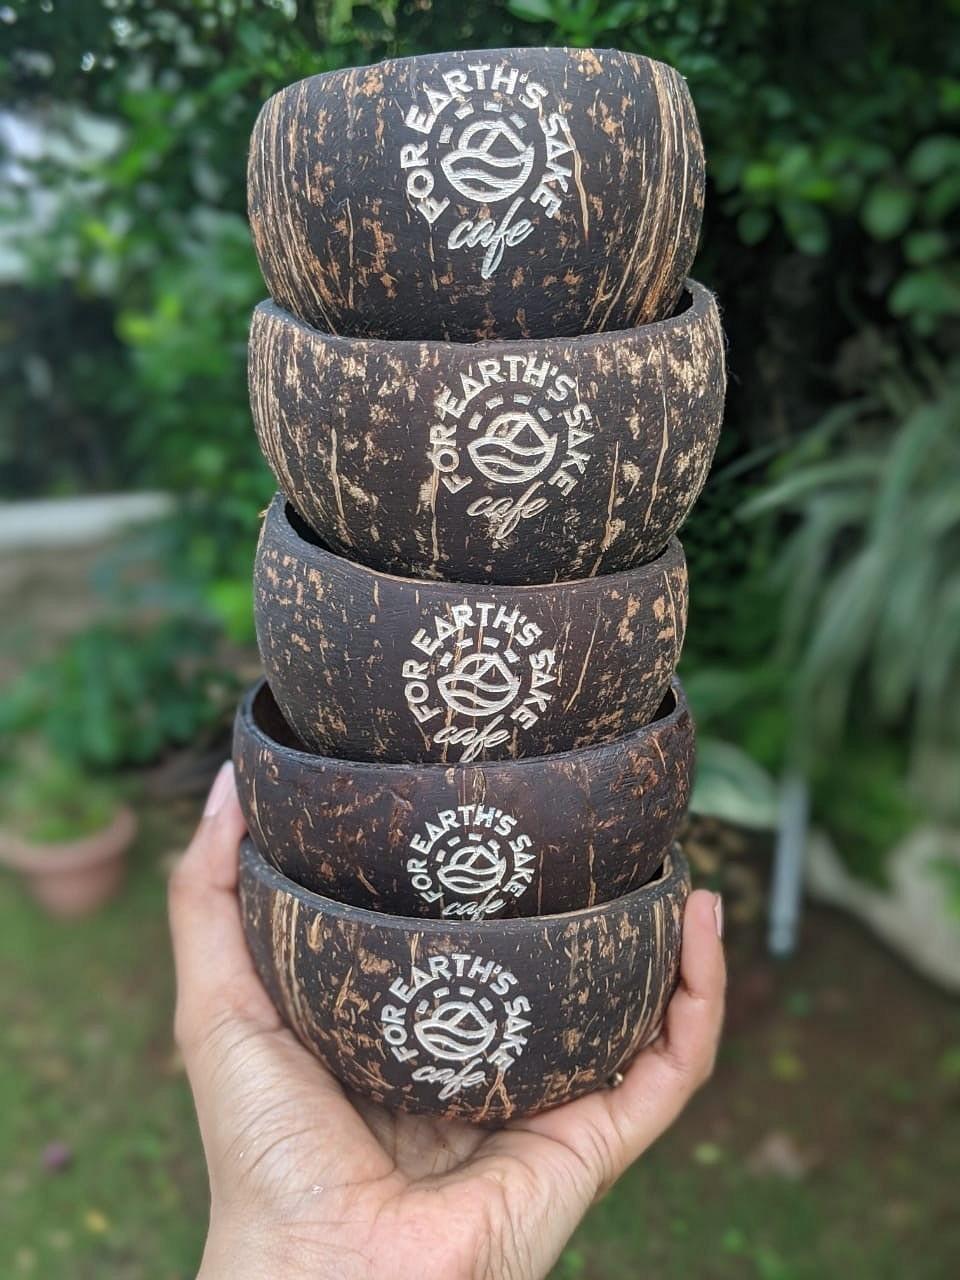 coconut shell bowls